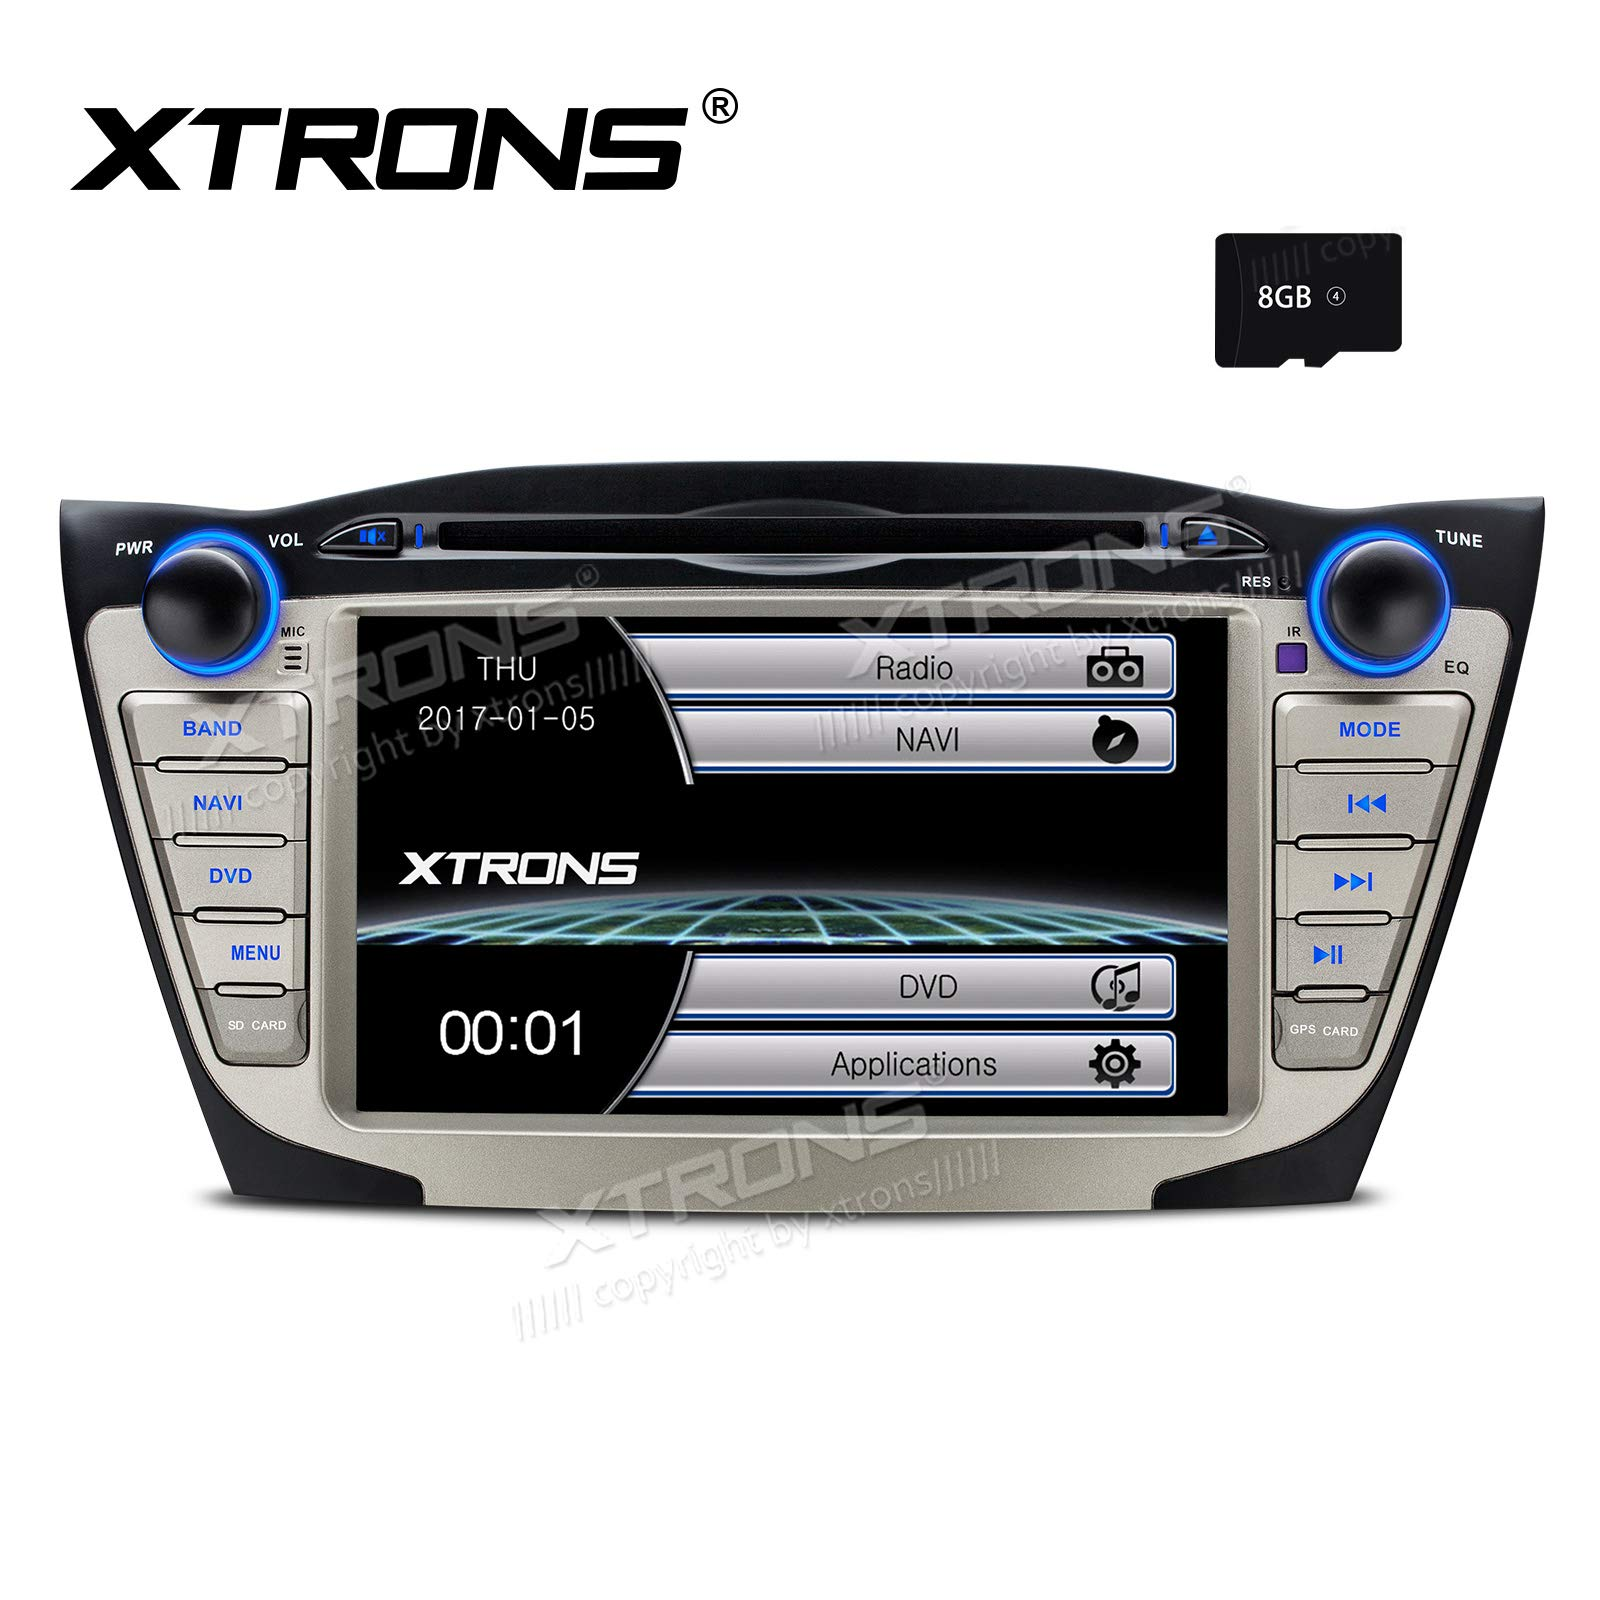 XTRONS 7 Inch HD Digital Touch Screen Car Stereo Radio in-Dash DVD Player GPS Navigation Screen Mirroring Function for Hyundai Tucson ix35